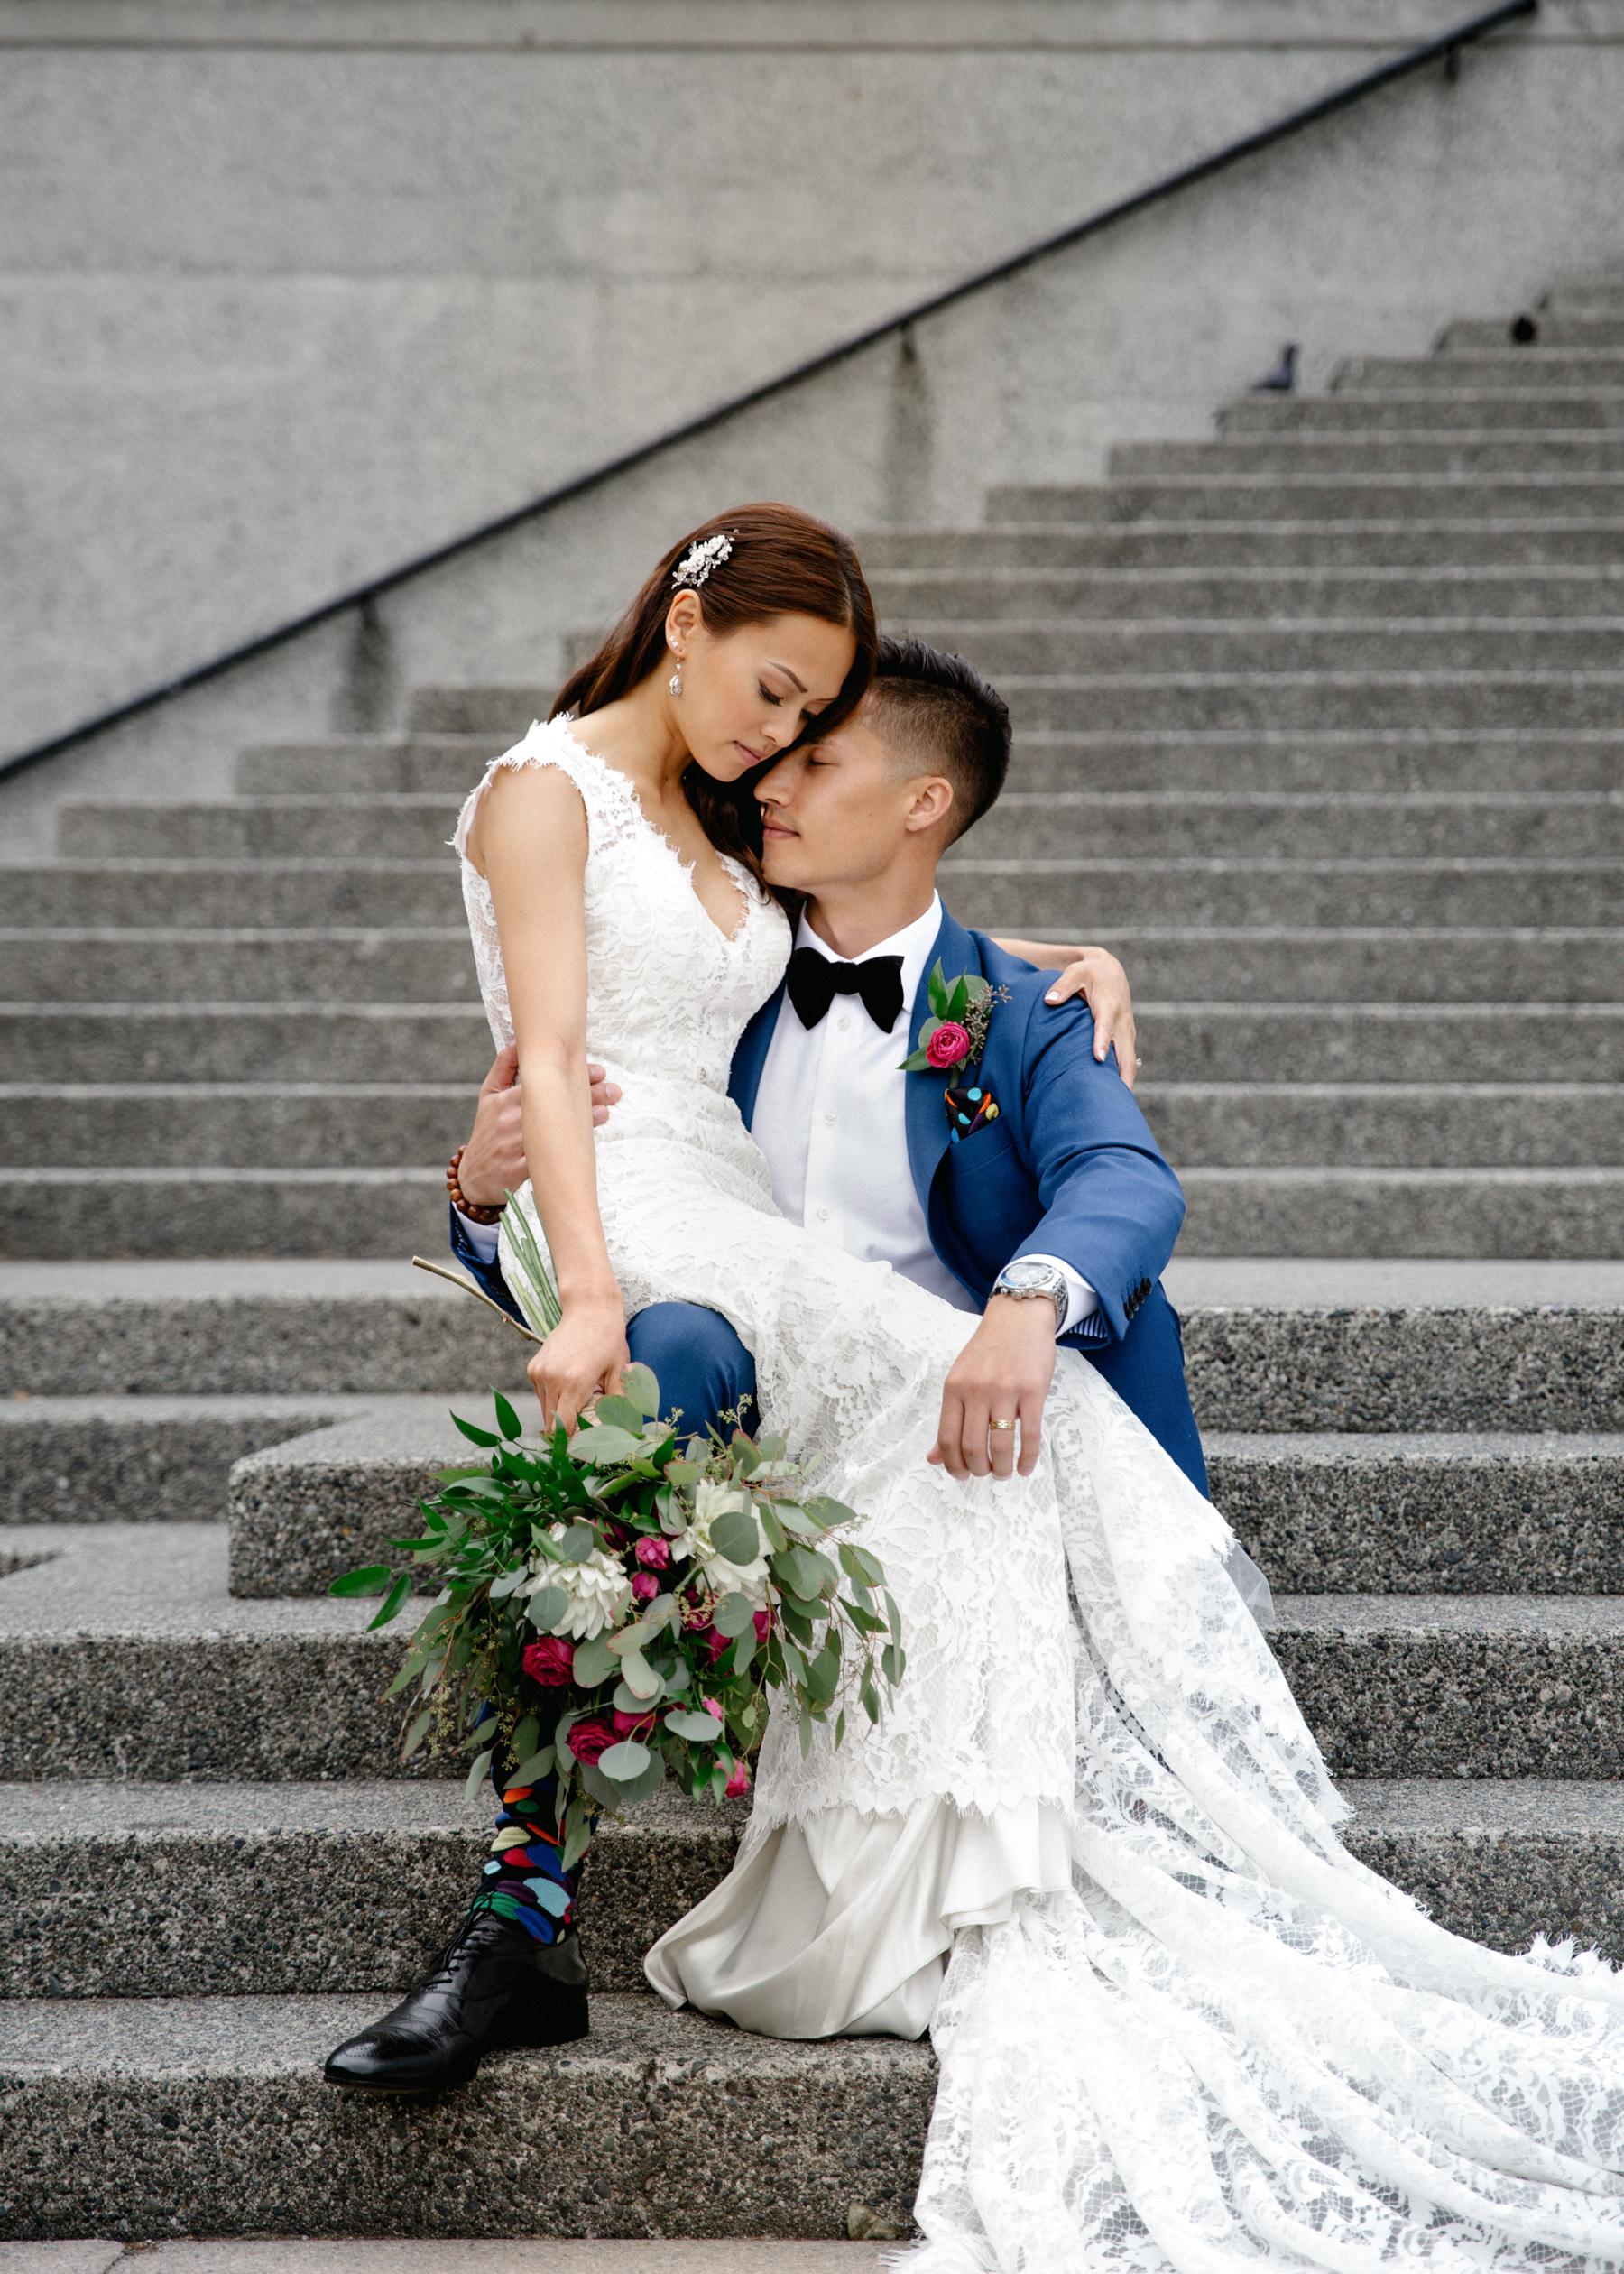 kaoverii_silva_photographer_via-herafilms_kieu_kaz_wedding-17.jpg